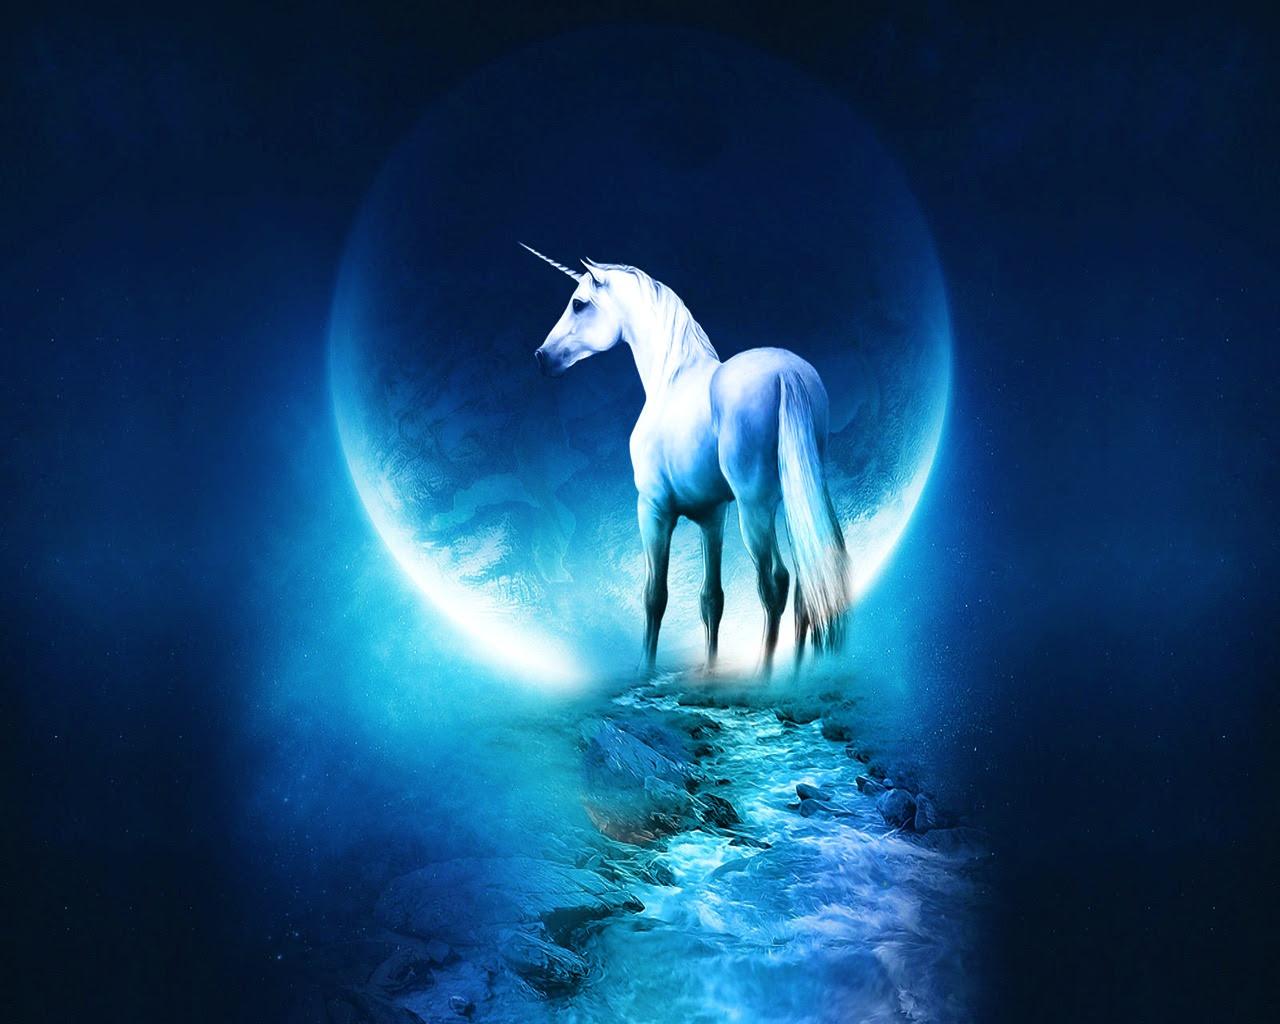 Fantasy images Unicorn wallpaper photos 31301602